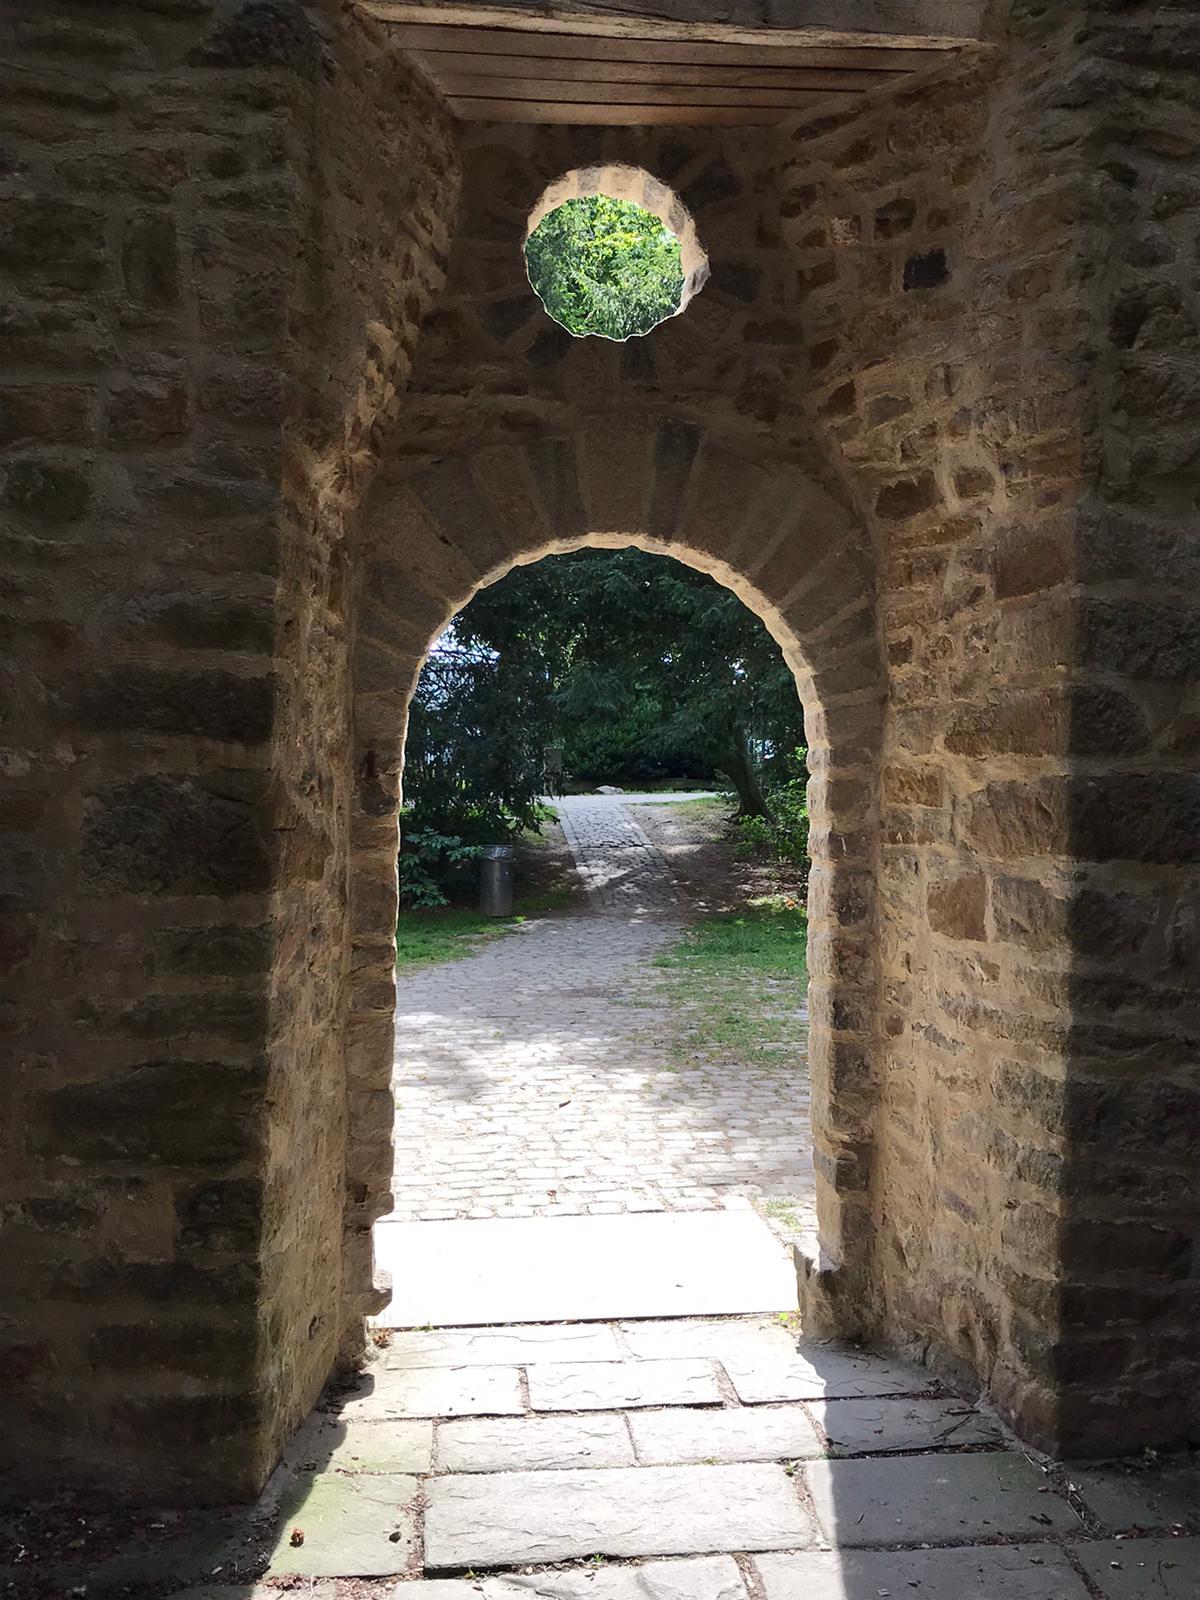 Der ehemalige Eingang der Kapelle